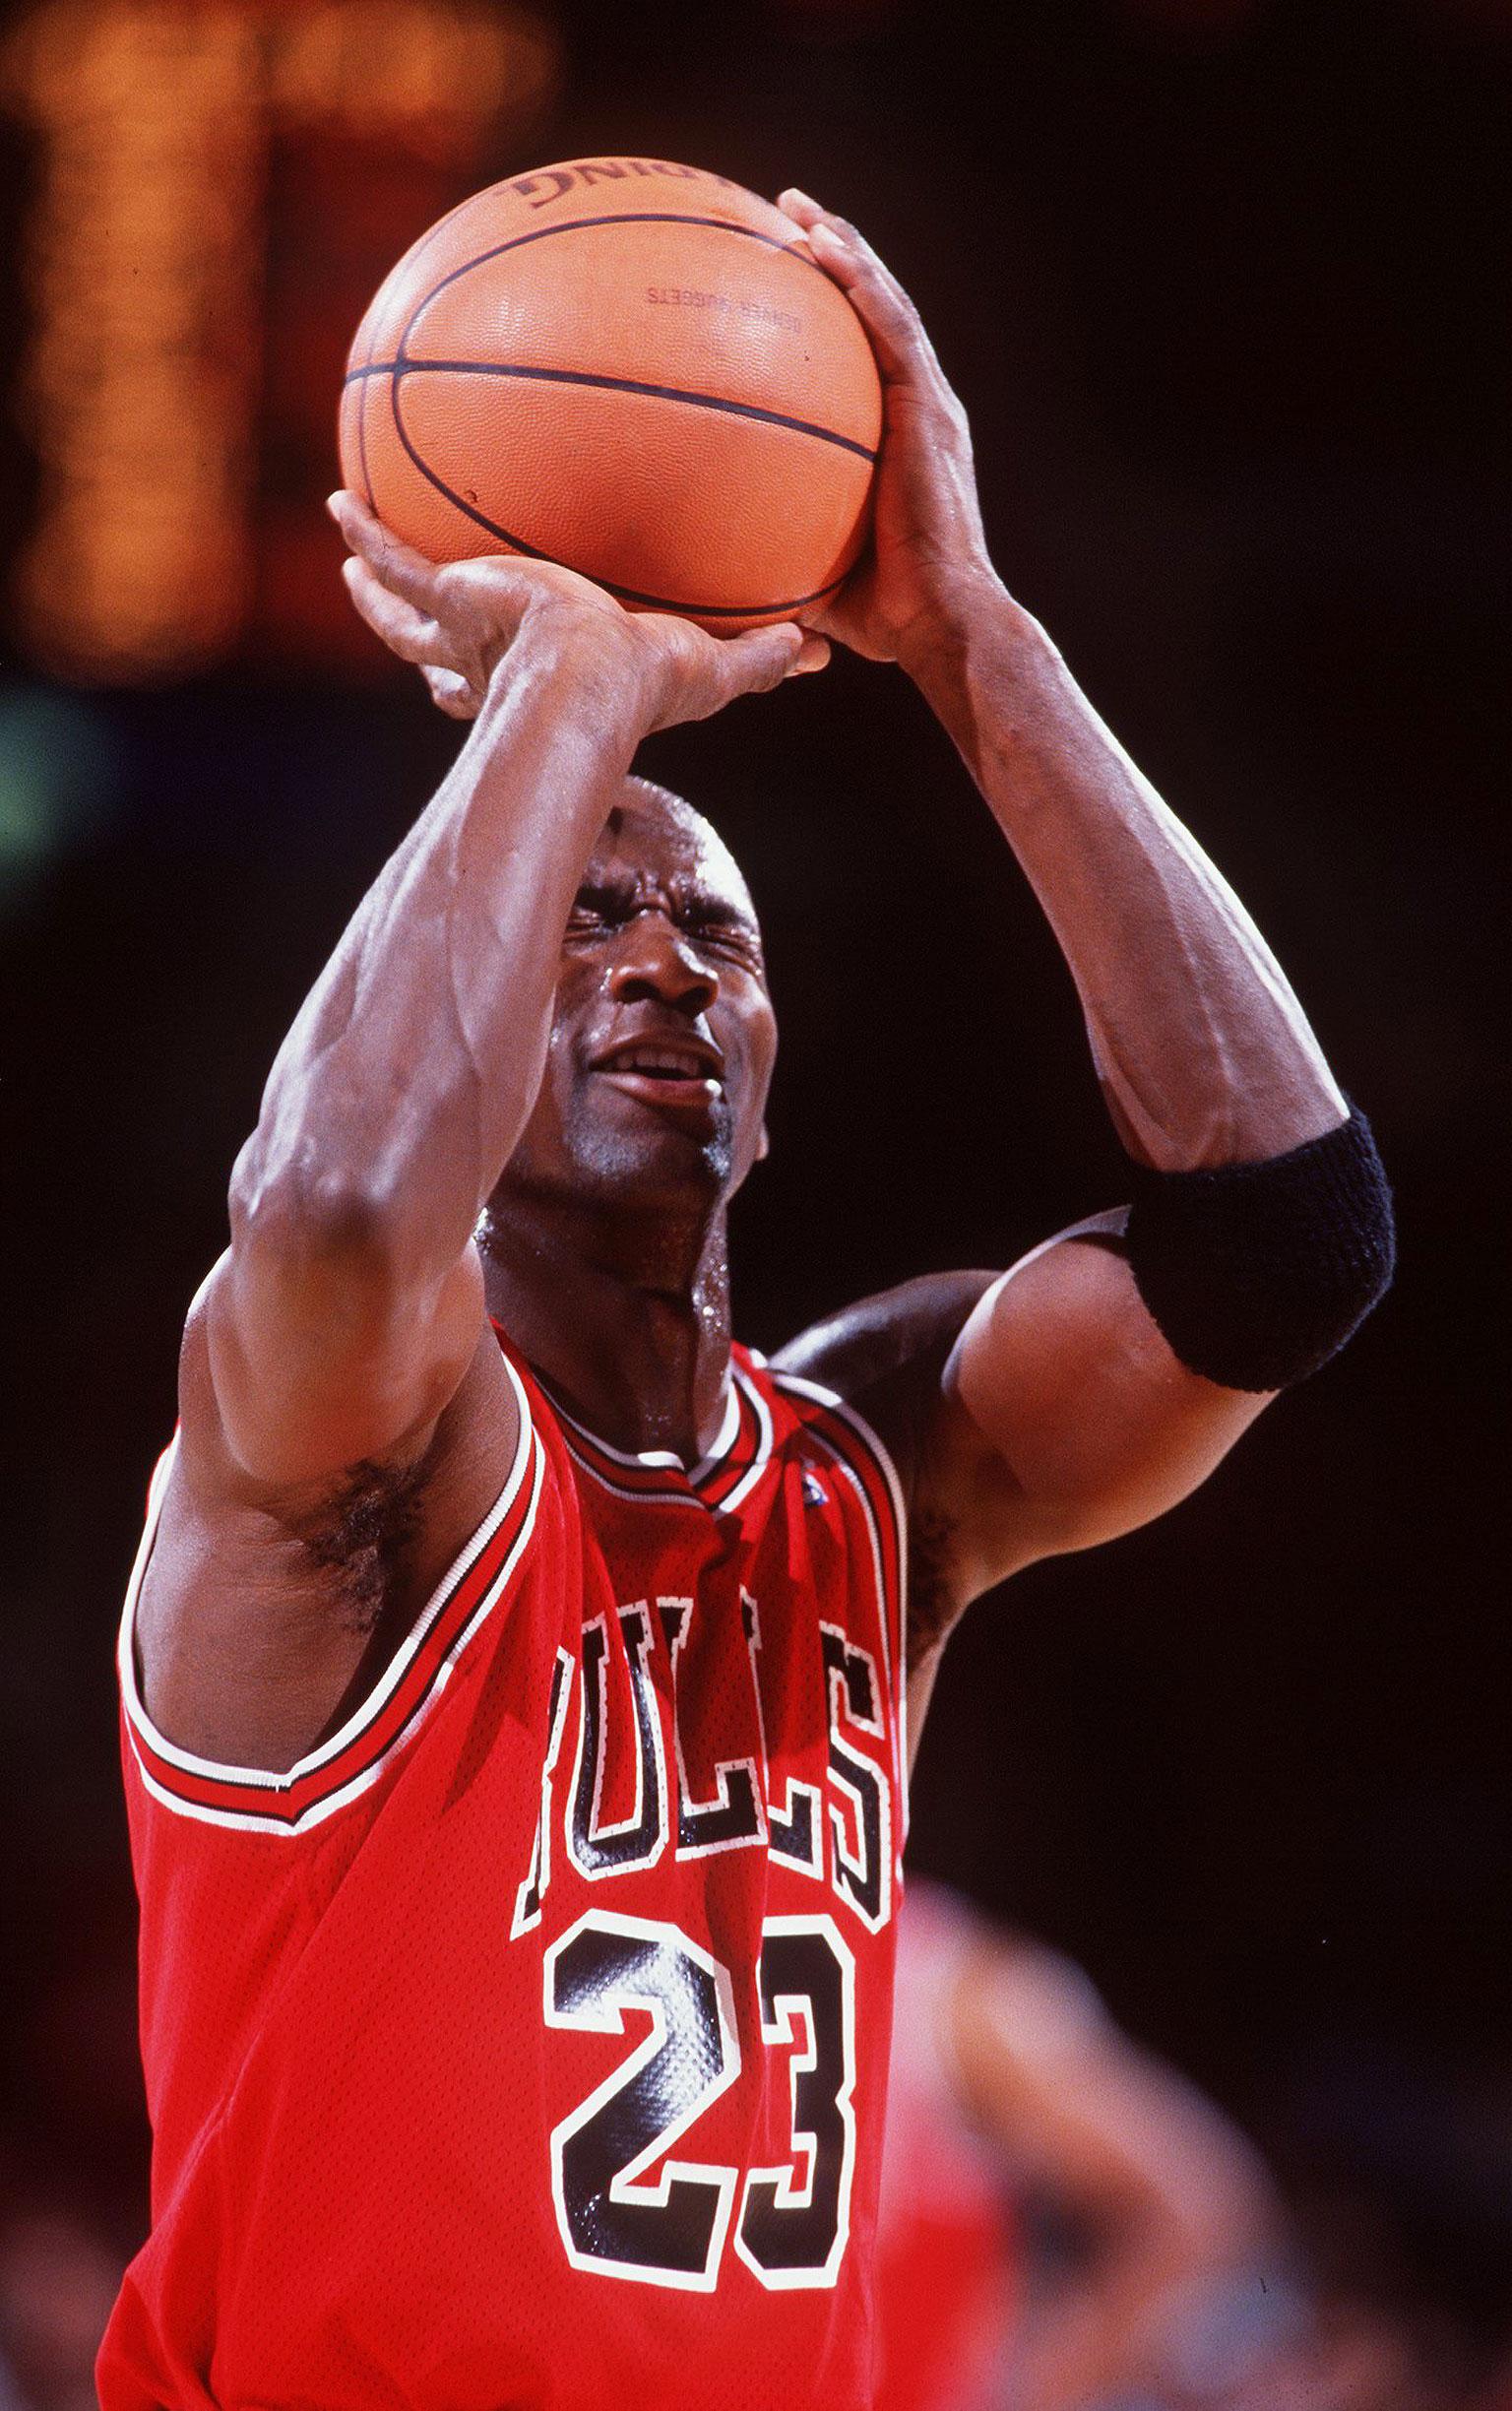 35 Blind Free Throw Michael Jordan 50 Greatest Moments ESPN